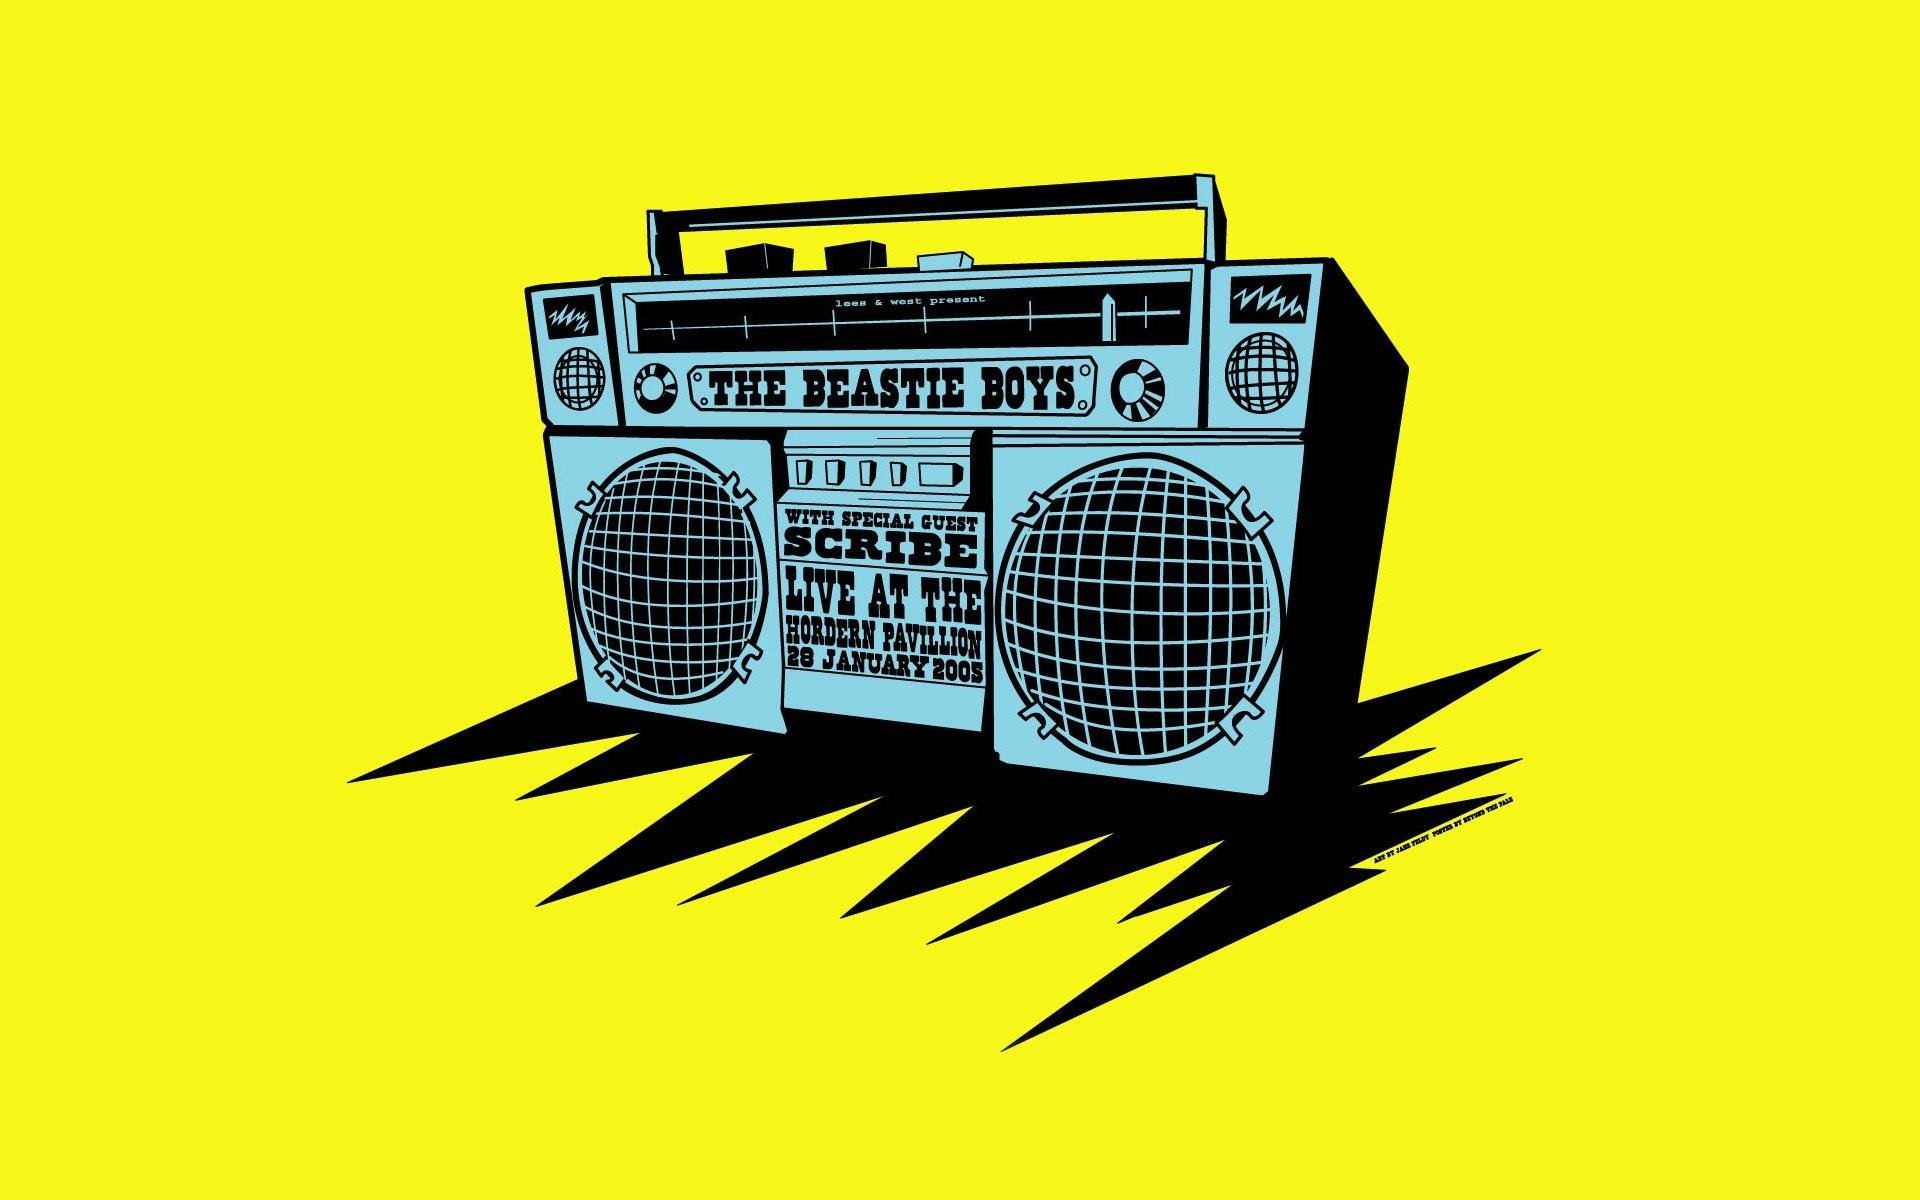 Res: 1920x1200, Music - Beastie Boys Wallpaper